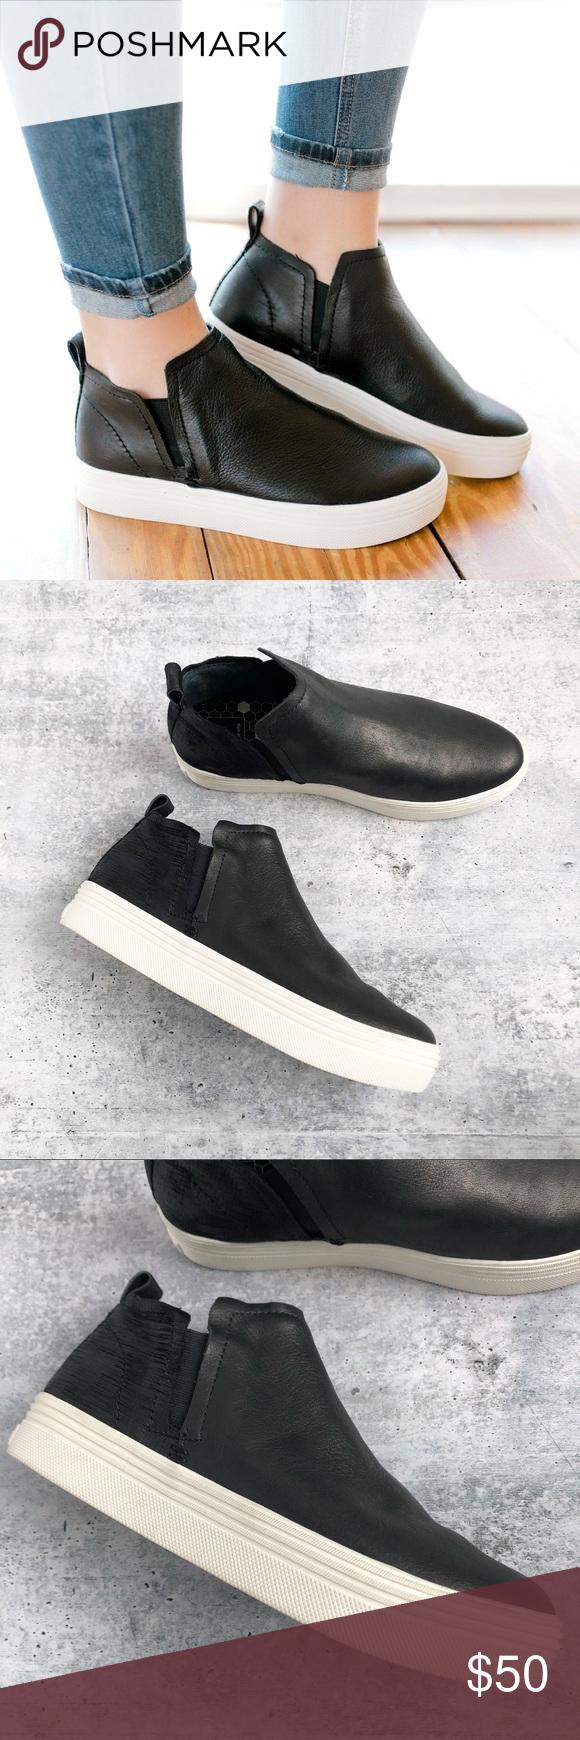 New Dolce Vita Tate Platform Sneakers